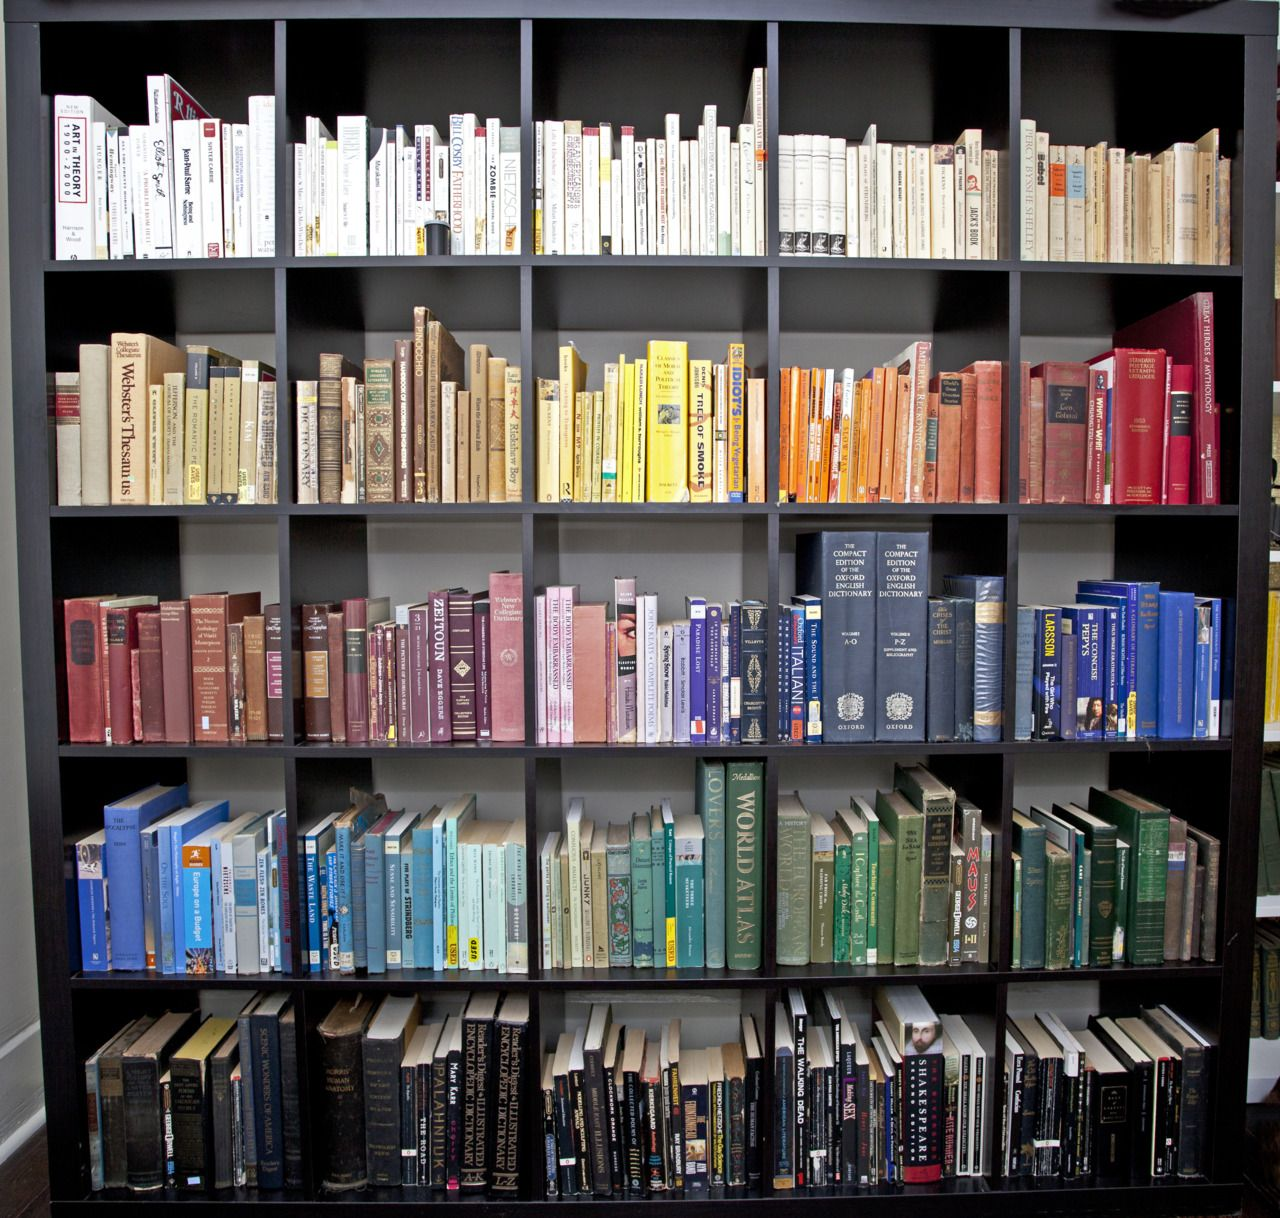 Co colour coordinated bookshelf - Tumblr